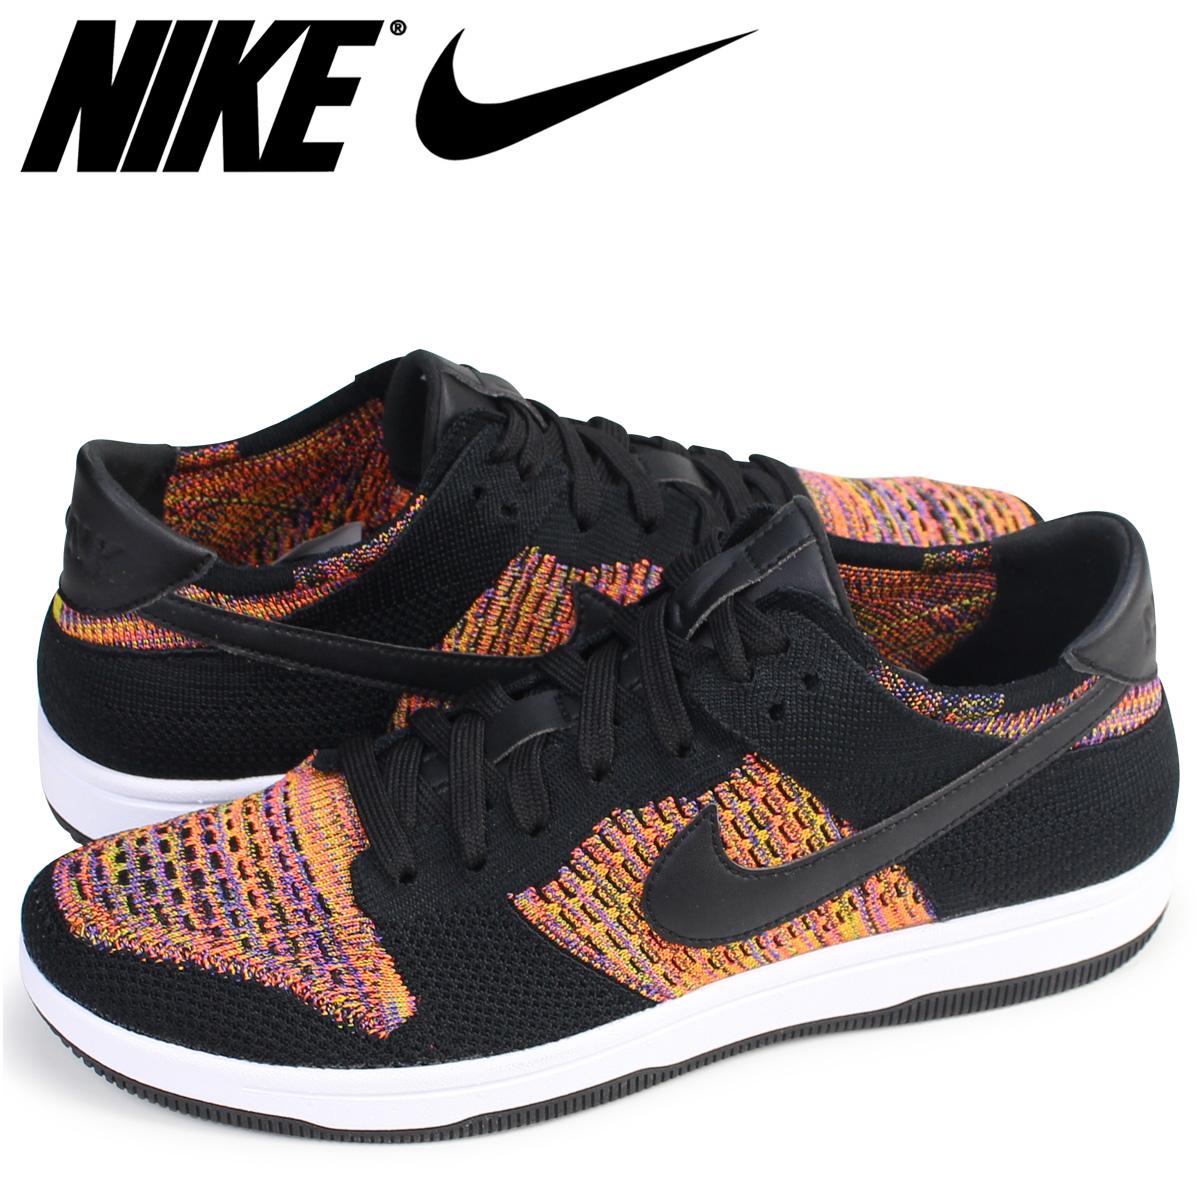 a2c344707b3e6 ALLSPORTS  NIKE Nike dunk loaf rye knit sneakers DUNK LOW FLYKNIT ...